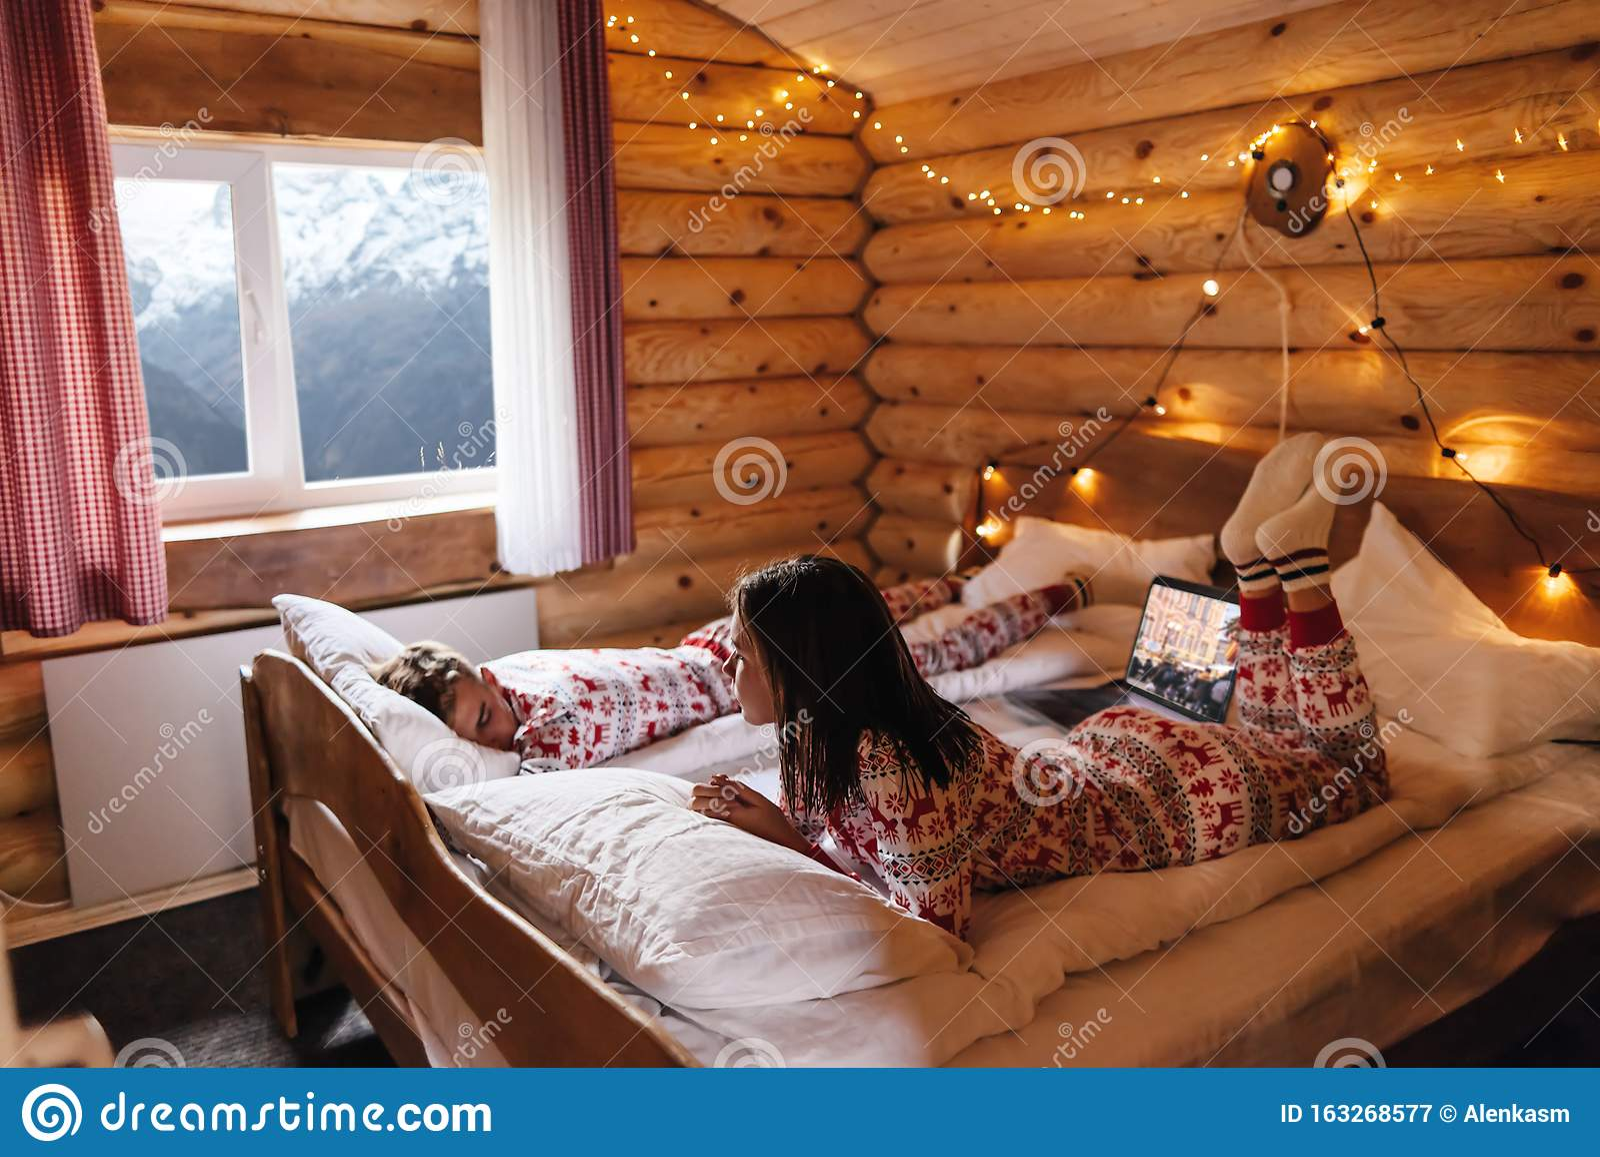 Teen Friends In Same Christmas Pajamas Relaxing In Bed ...